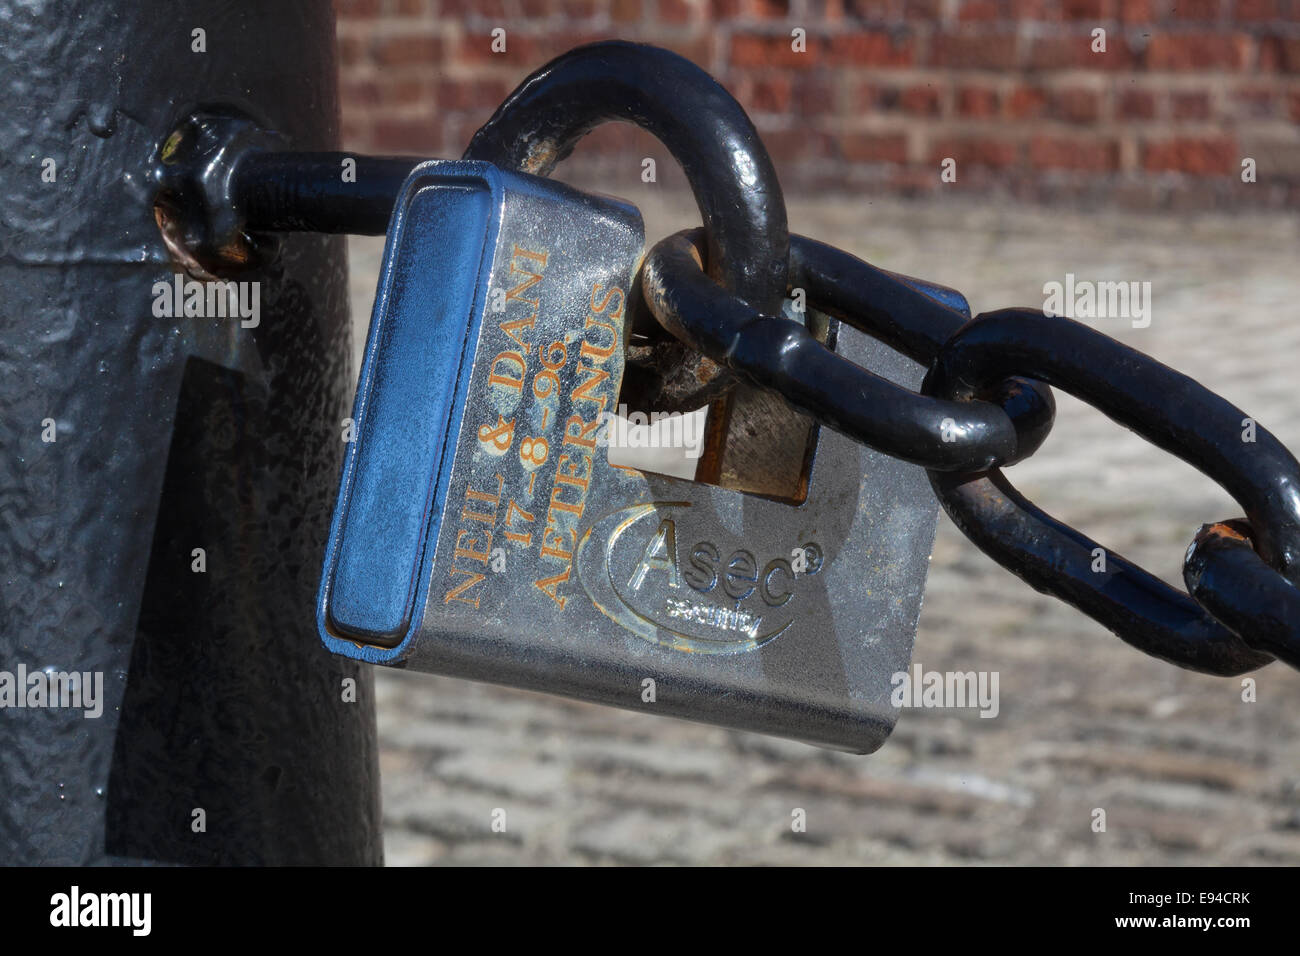 Liverpool, Merseyside, UK. 19th Oct, 2014. The future of hundreds of sentimental love locks at Liverpool's Albert - Stock Image